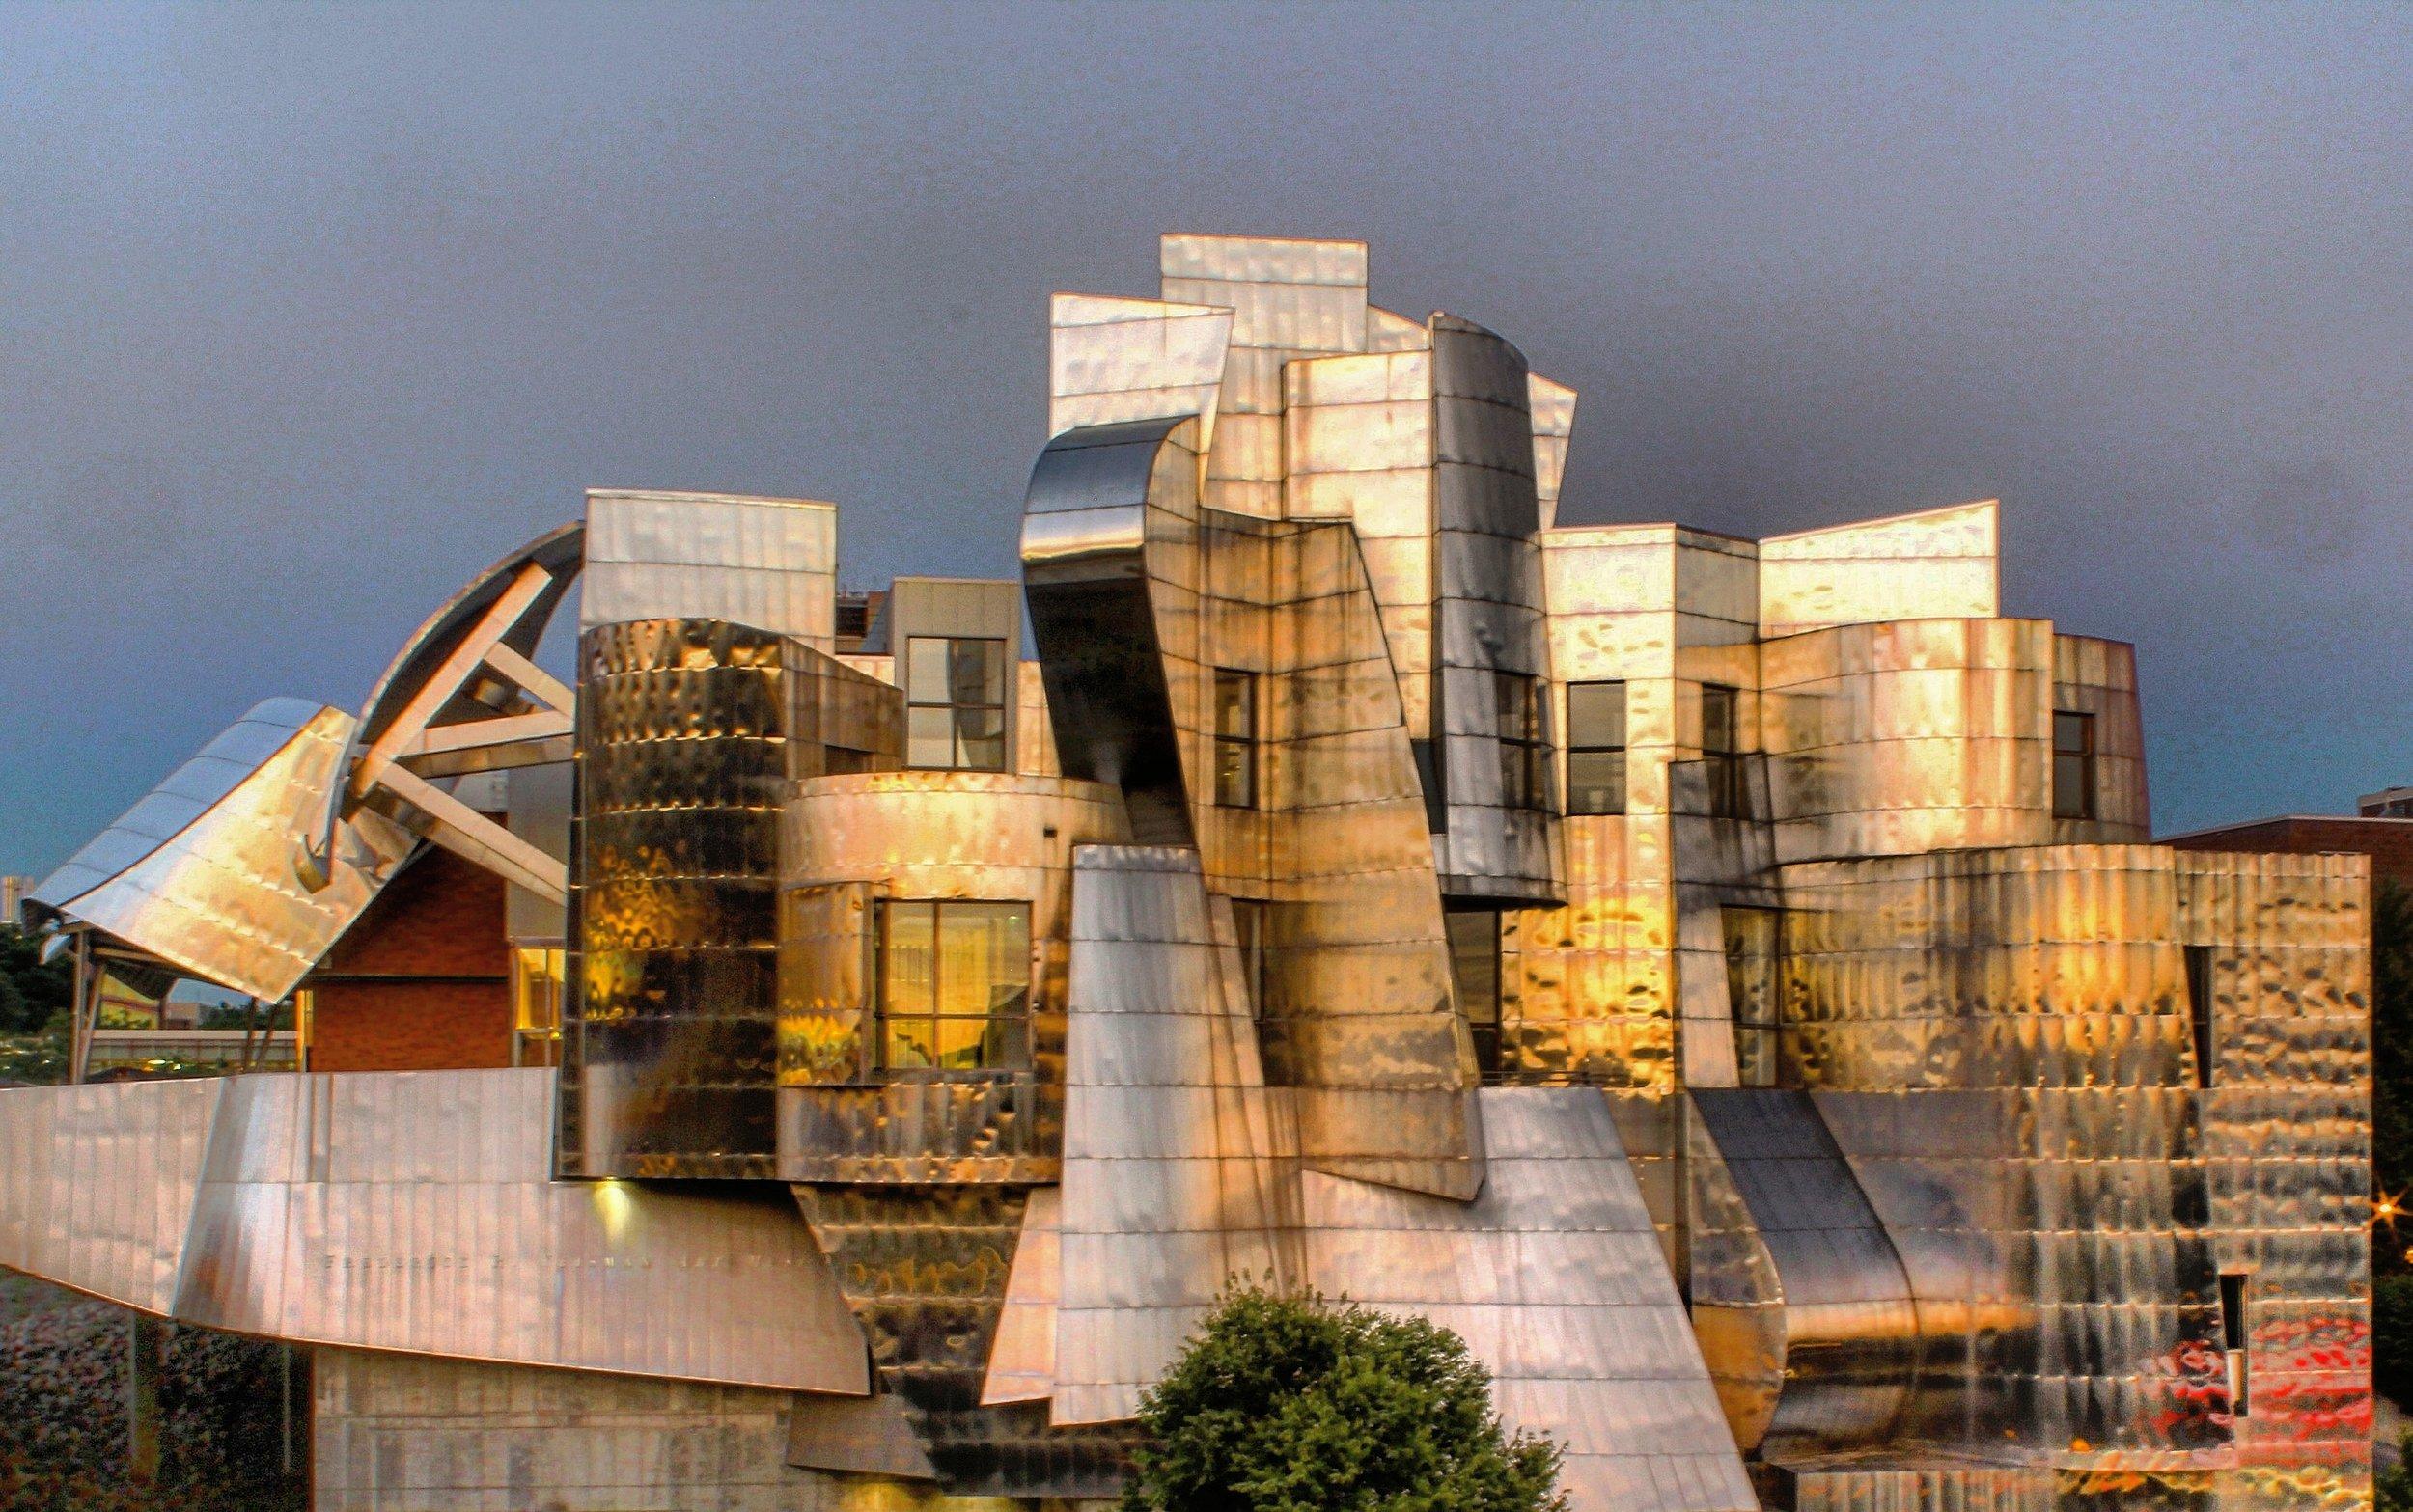 The Weisman Art Museum reflecting the sunset